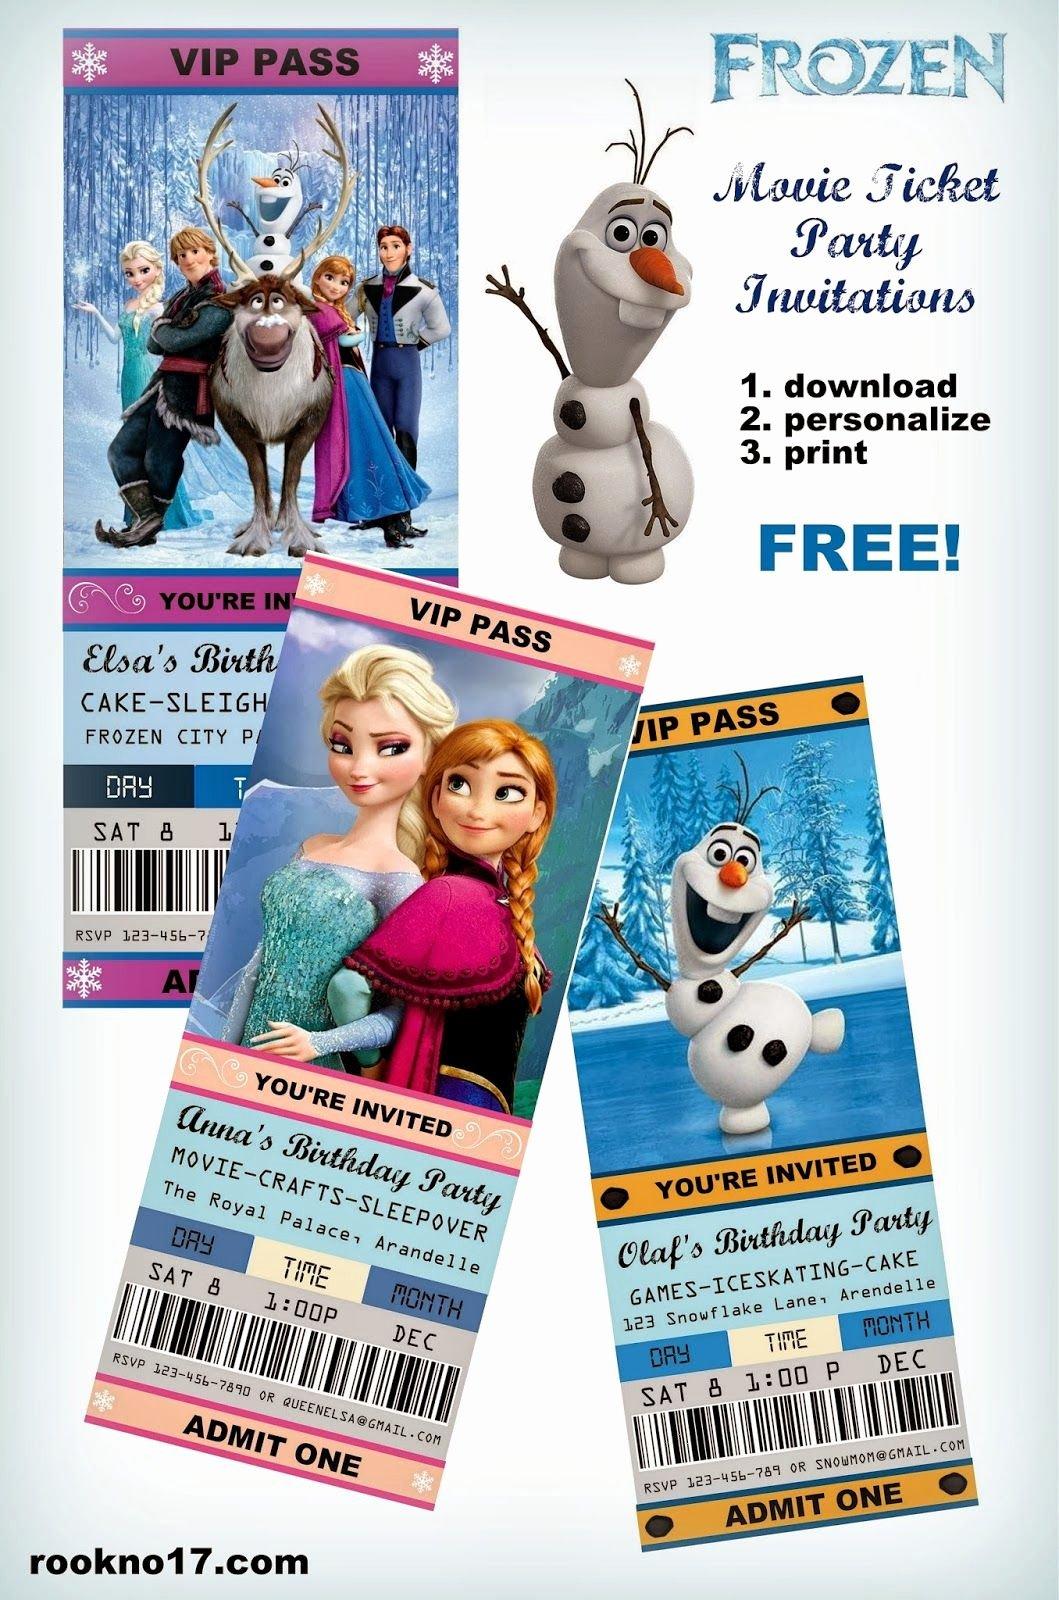 Frozen Invitation Template Free Download Beautiful Free Frozen Invitations On Pinterest